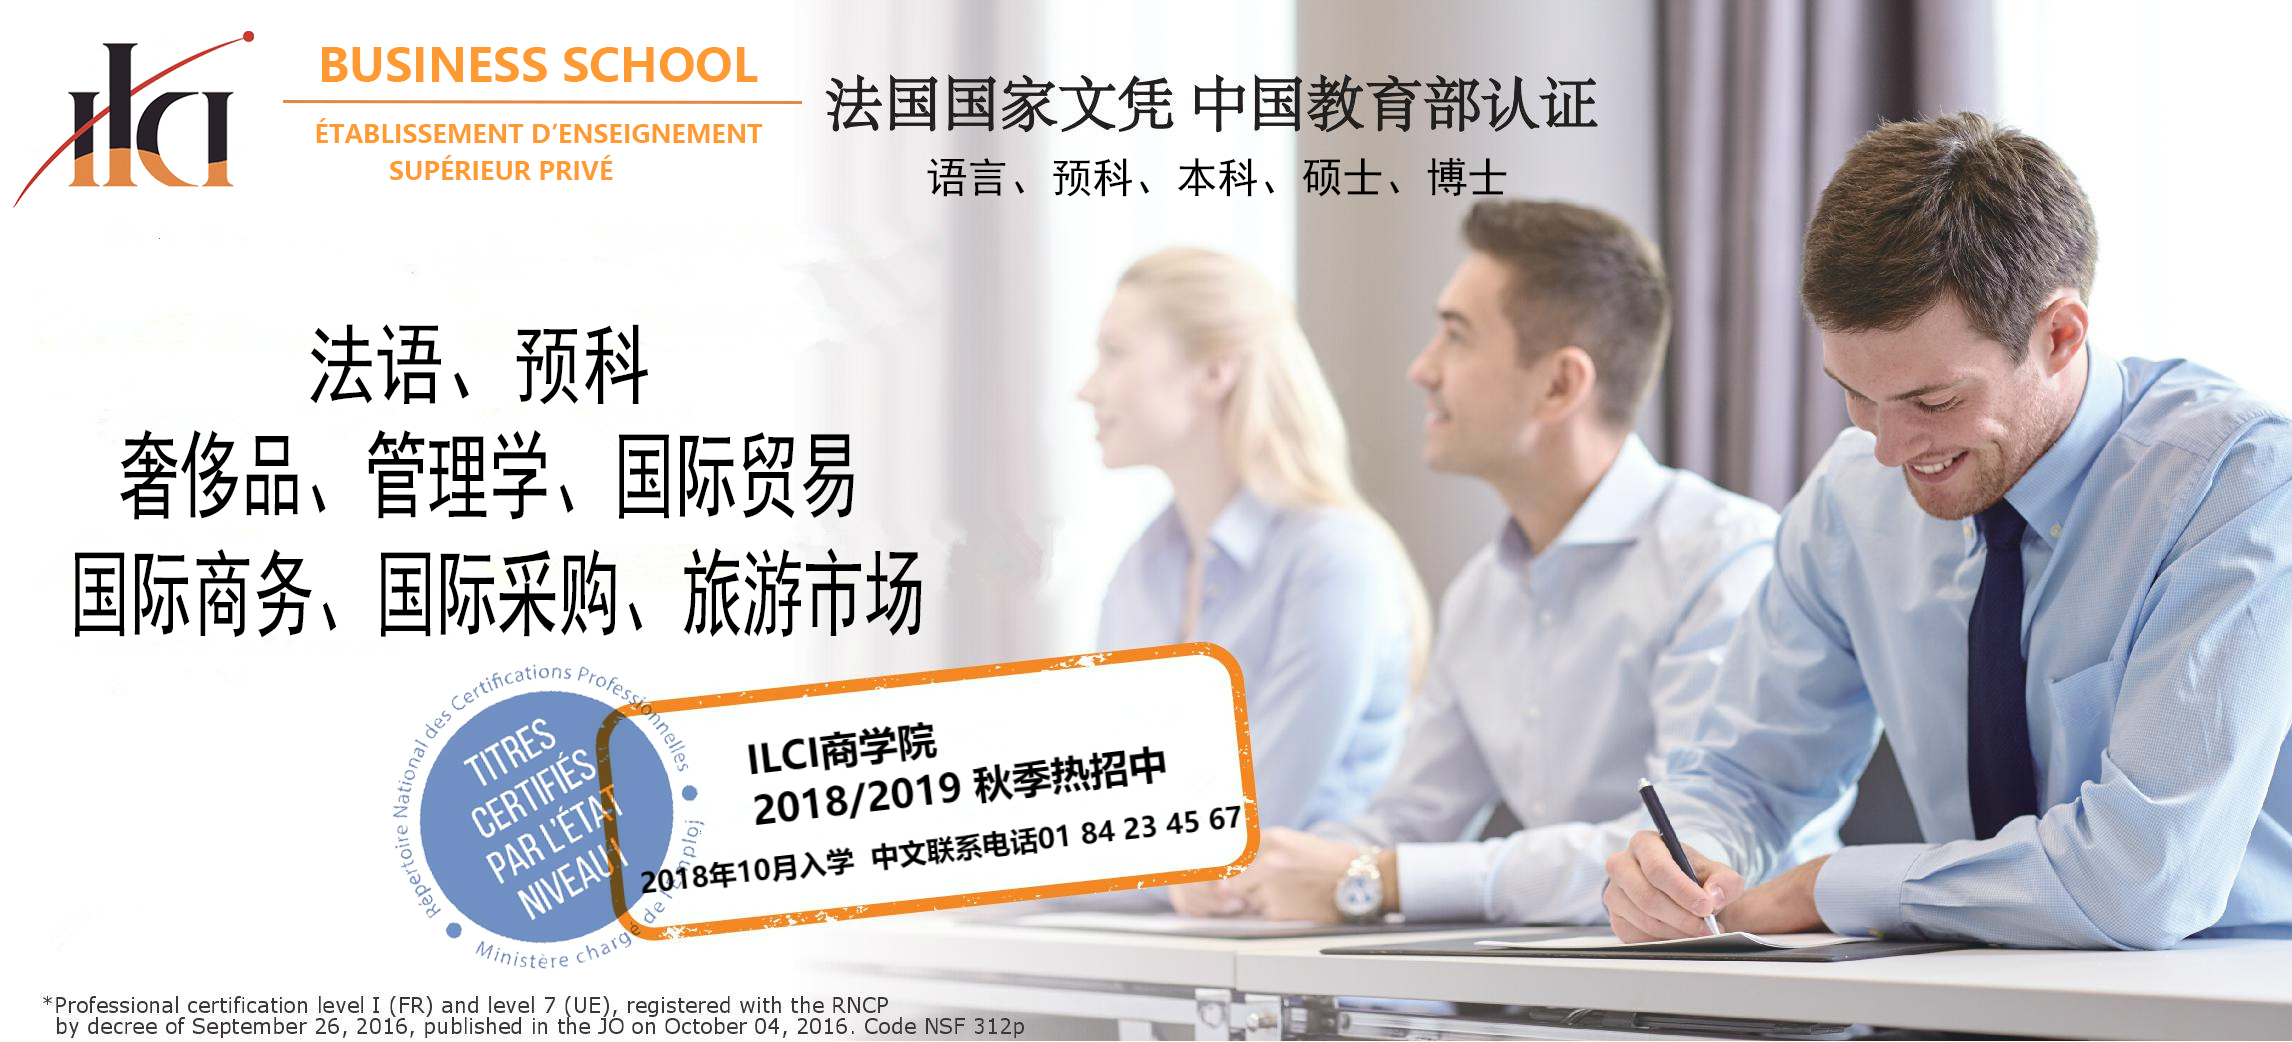 ILCI国际商语学院 澳门葡京网上娱乐欢迎您国家文凭 中国教育部认证